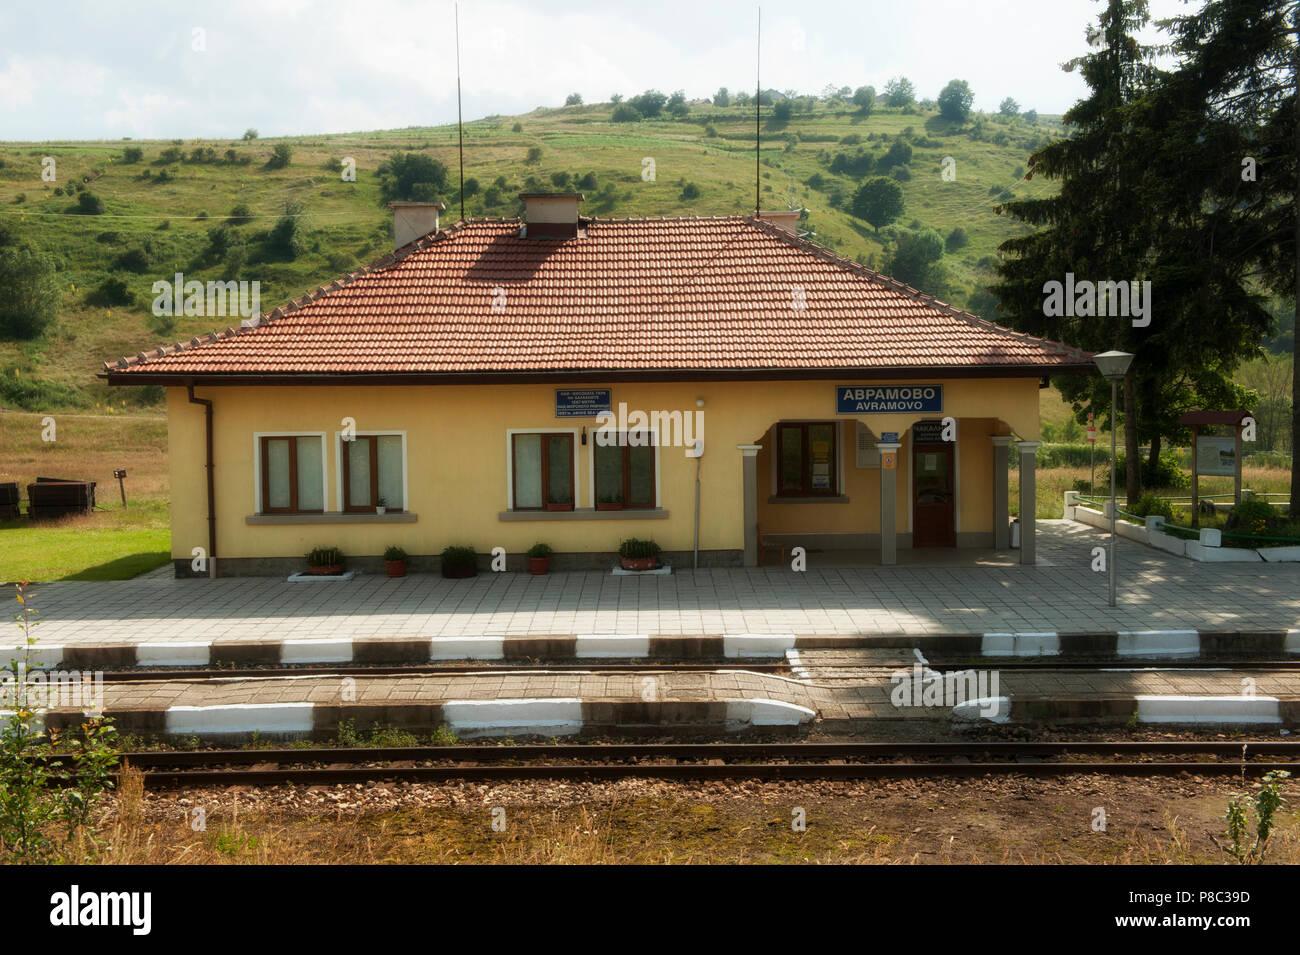 Train Travel Bulgaria, Balkans, - Stock Image